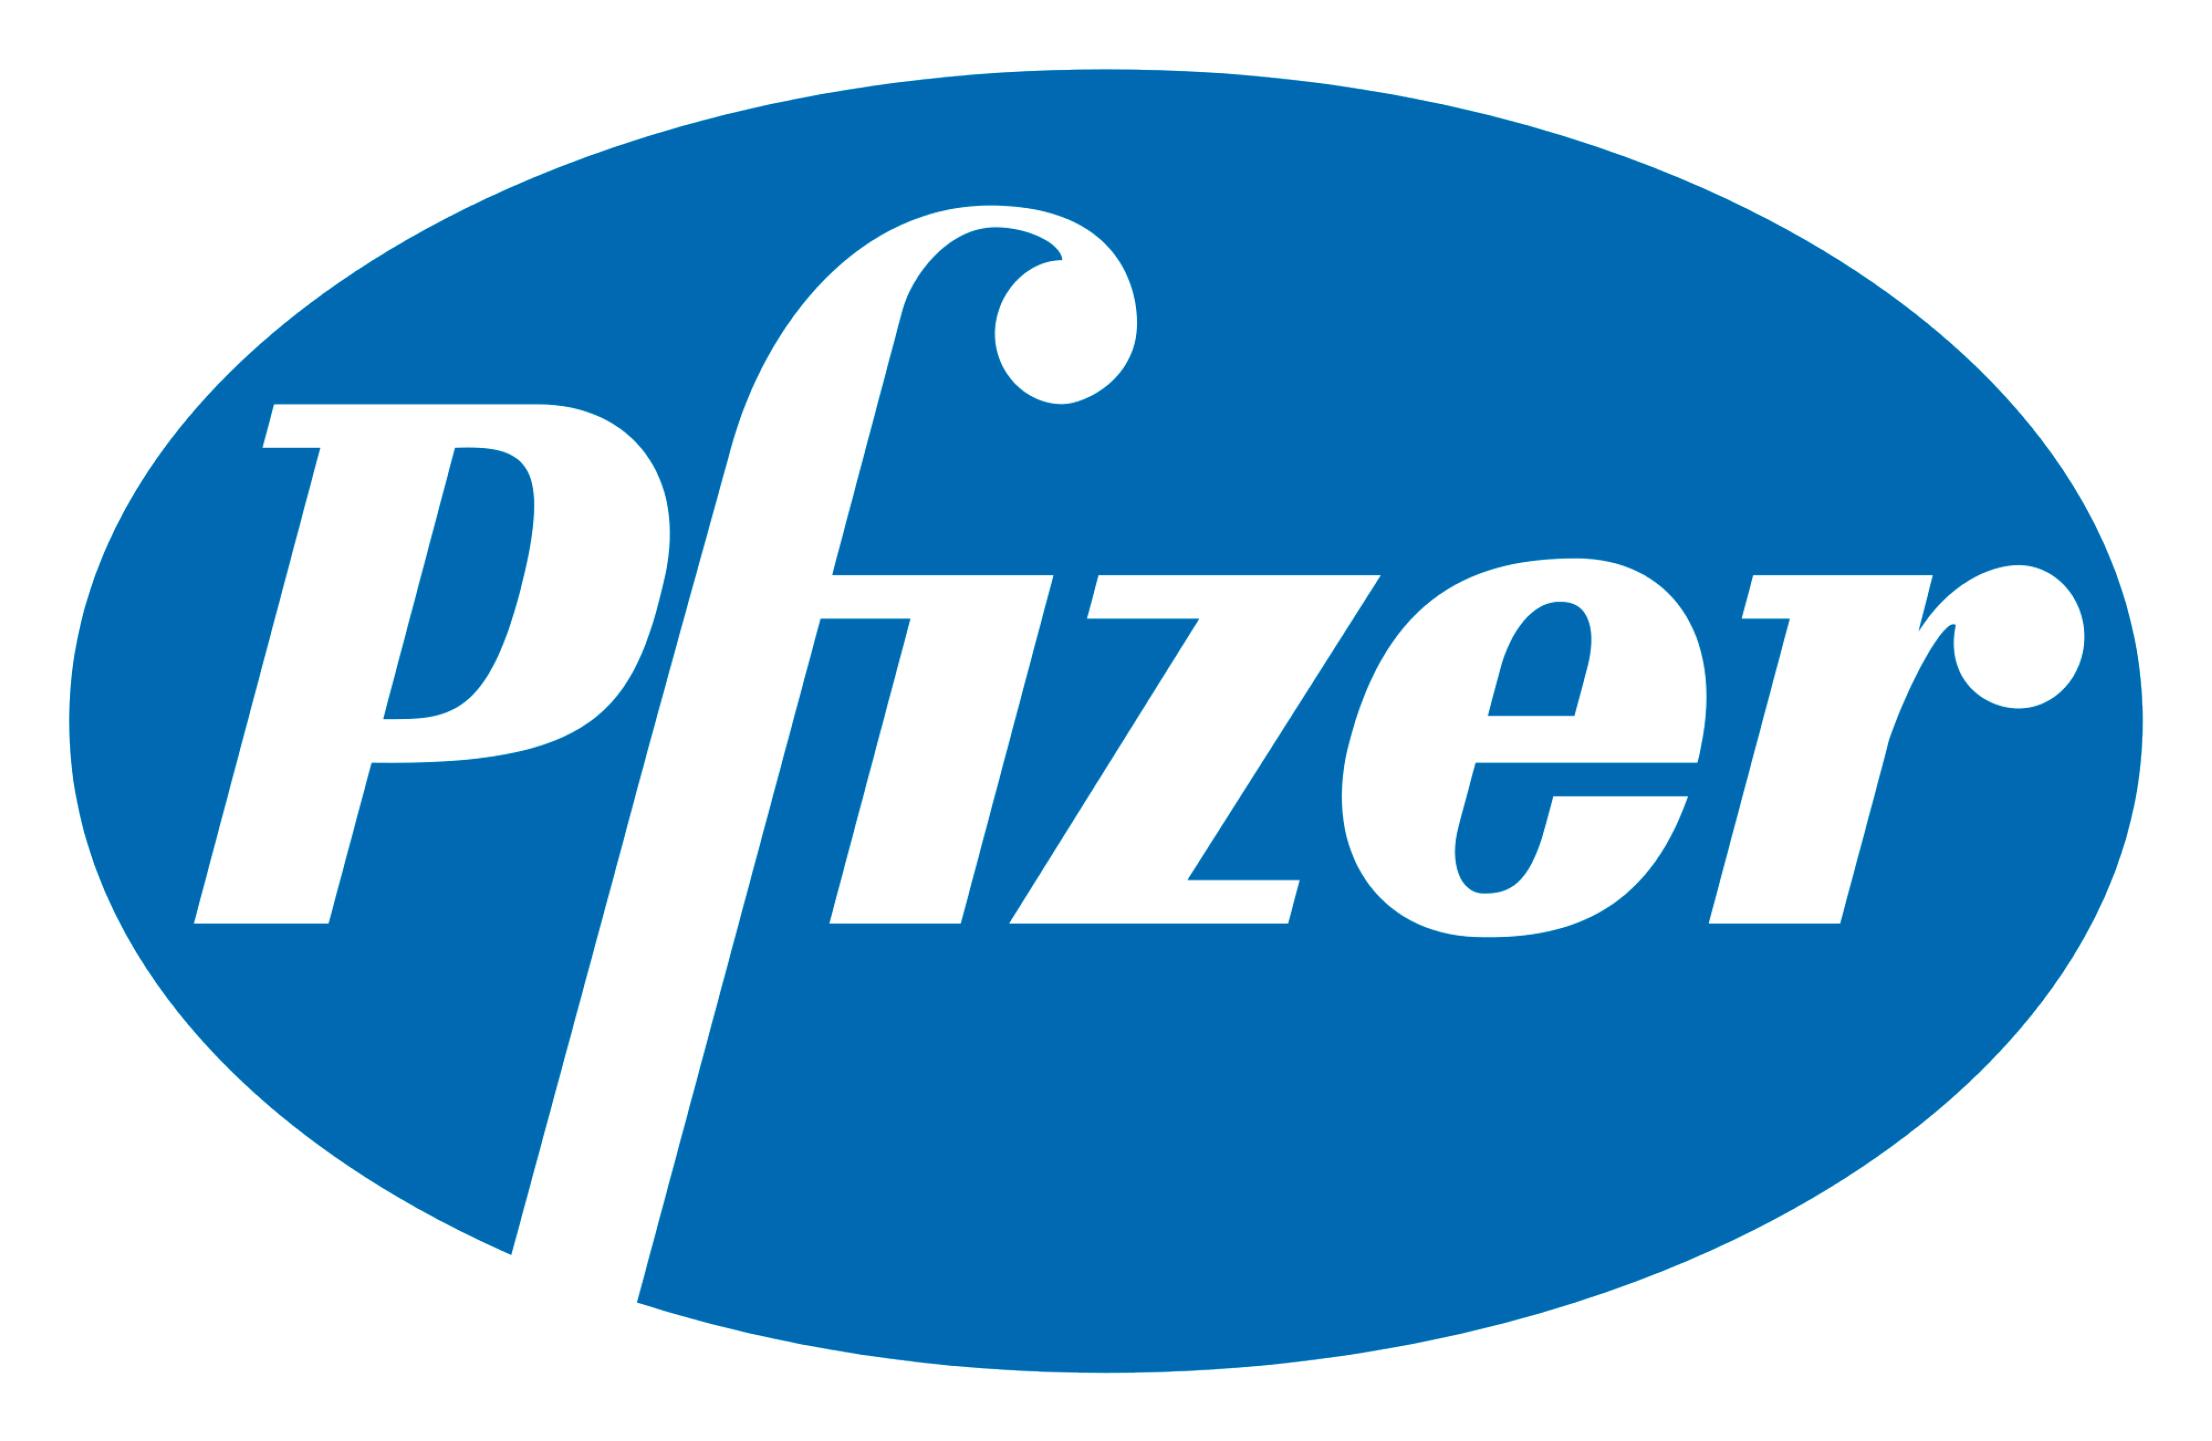 pfeizer